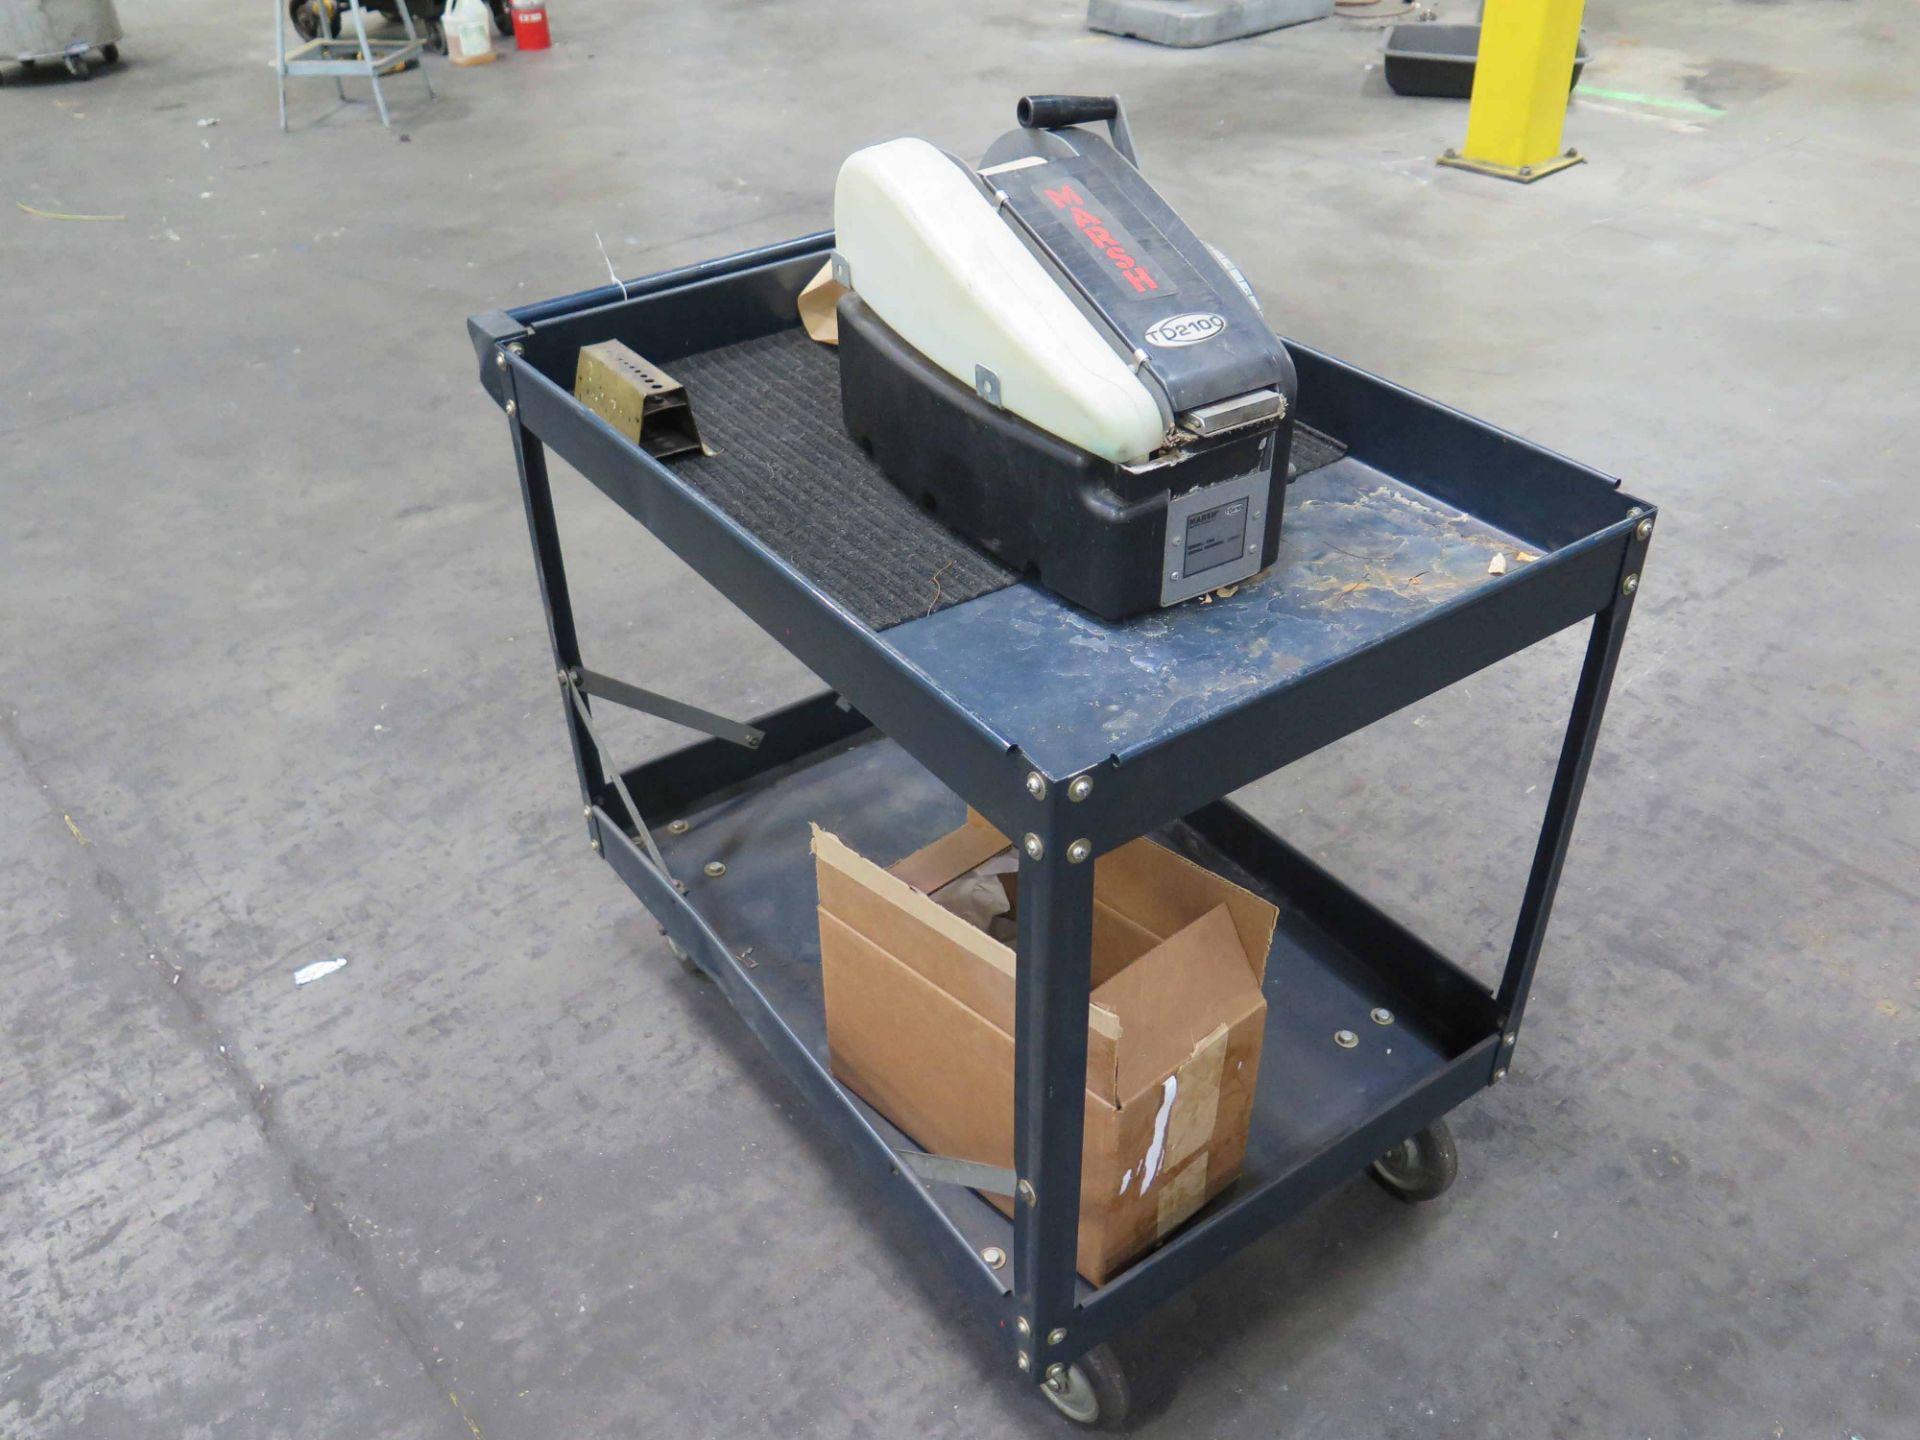 Lot 15 - TAPE DISPENSER, MARSH TD2100 (on metal shop cart)